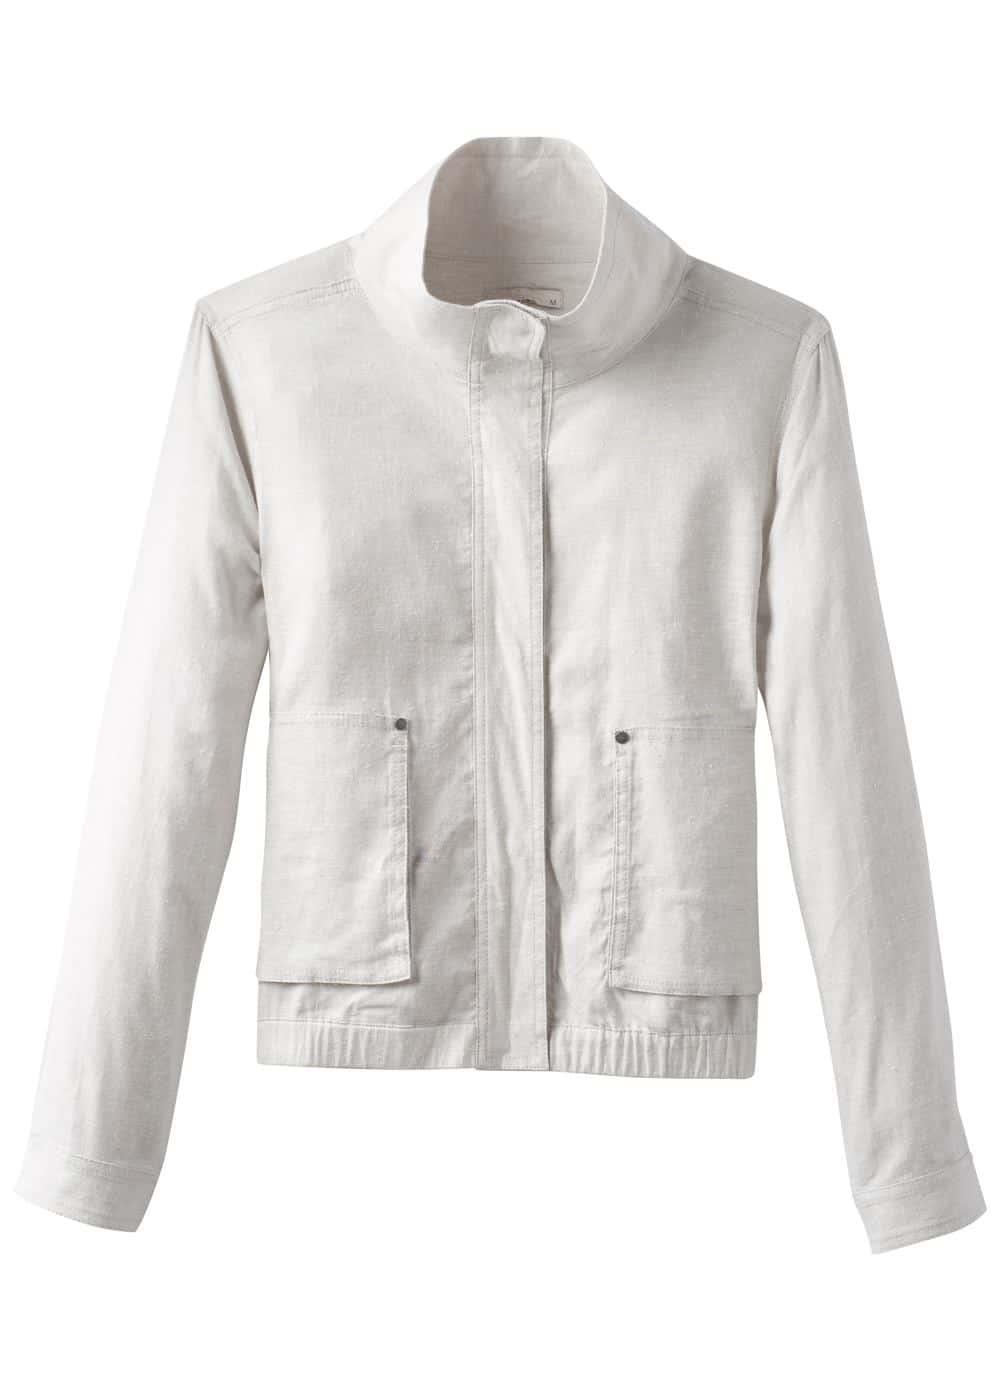 prAna-Snider Jacket - Women's